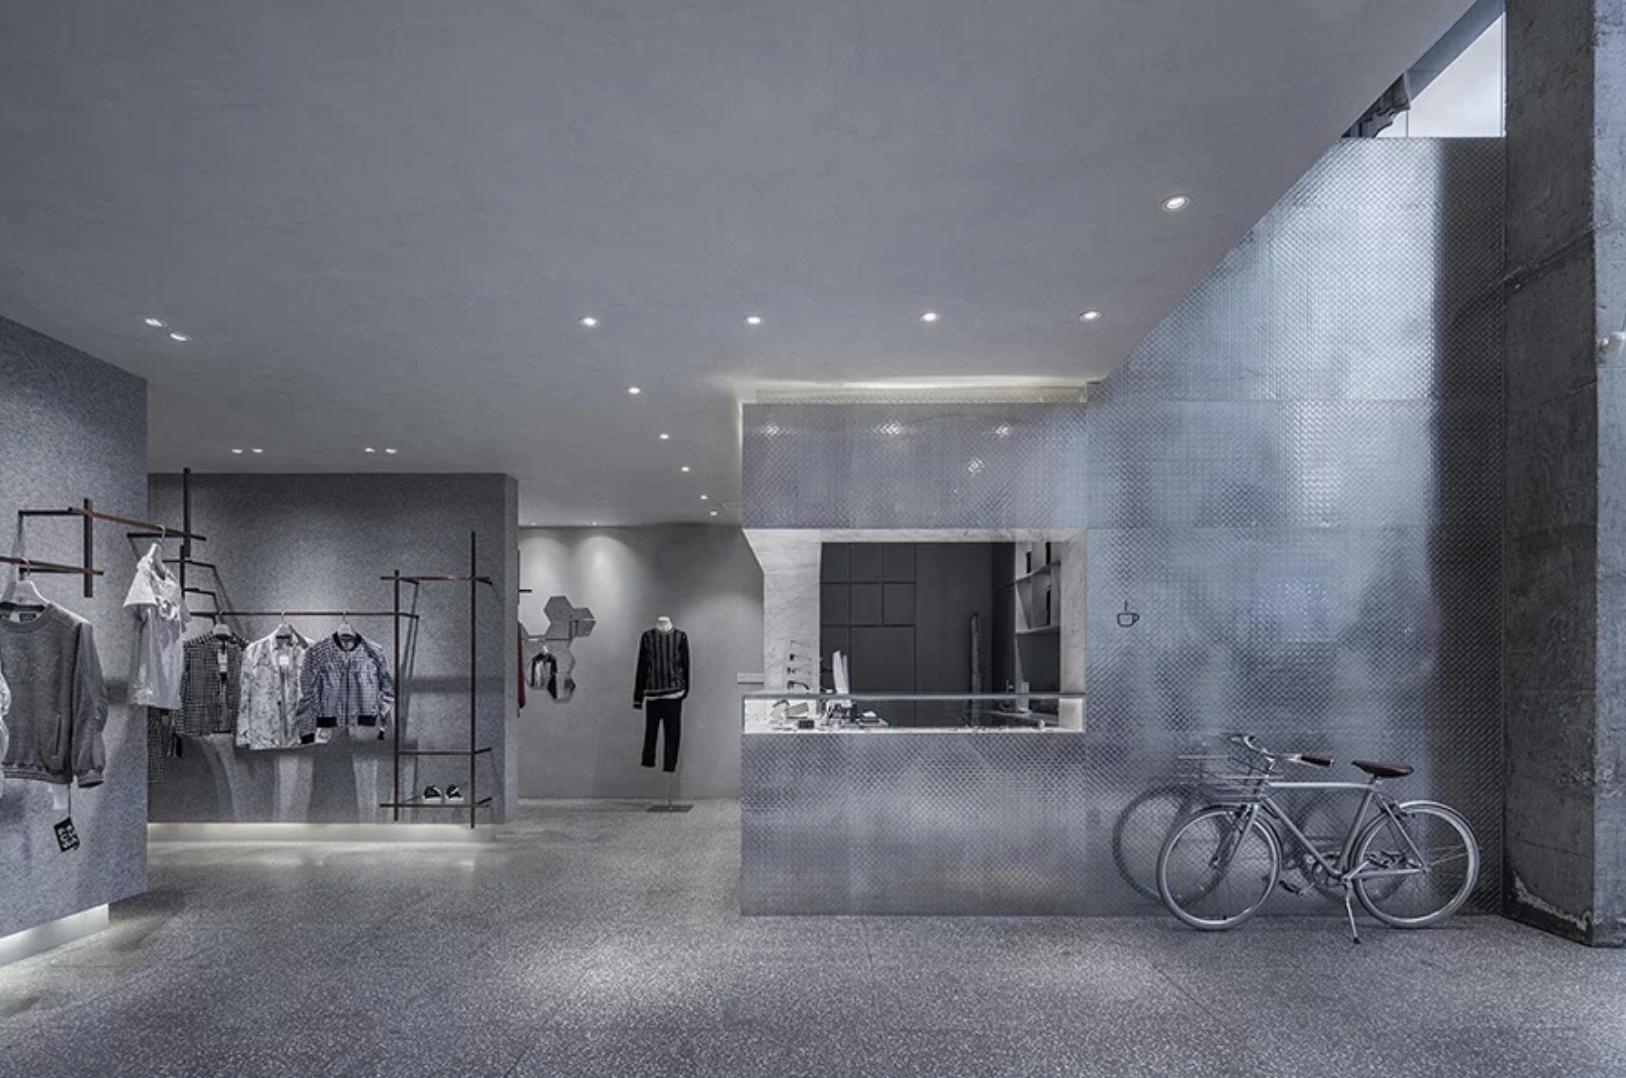 viventium-design-zac-kraemer-tag-boutique-retail-design-3.png